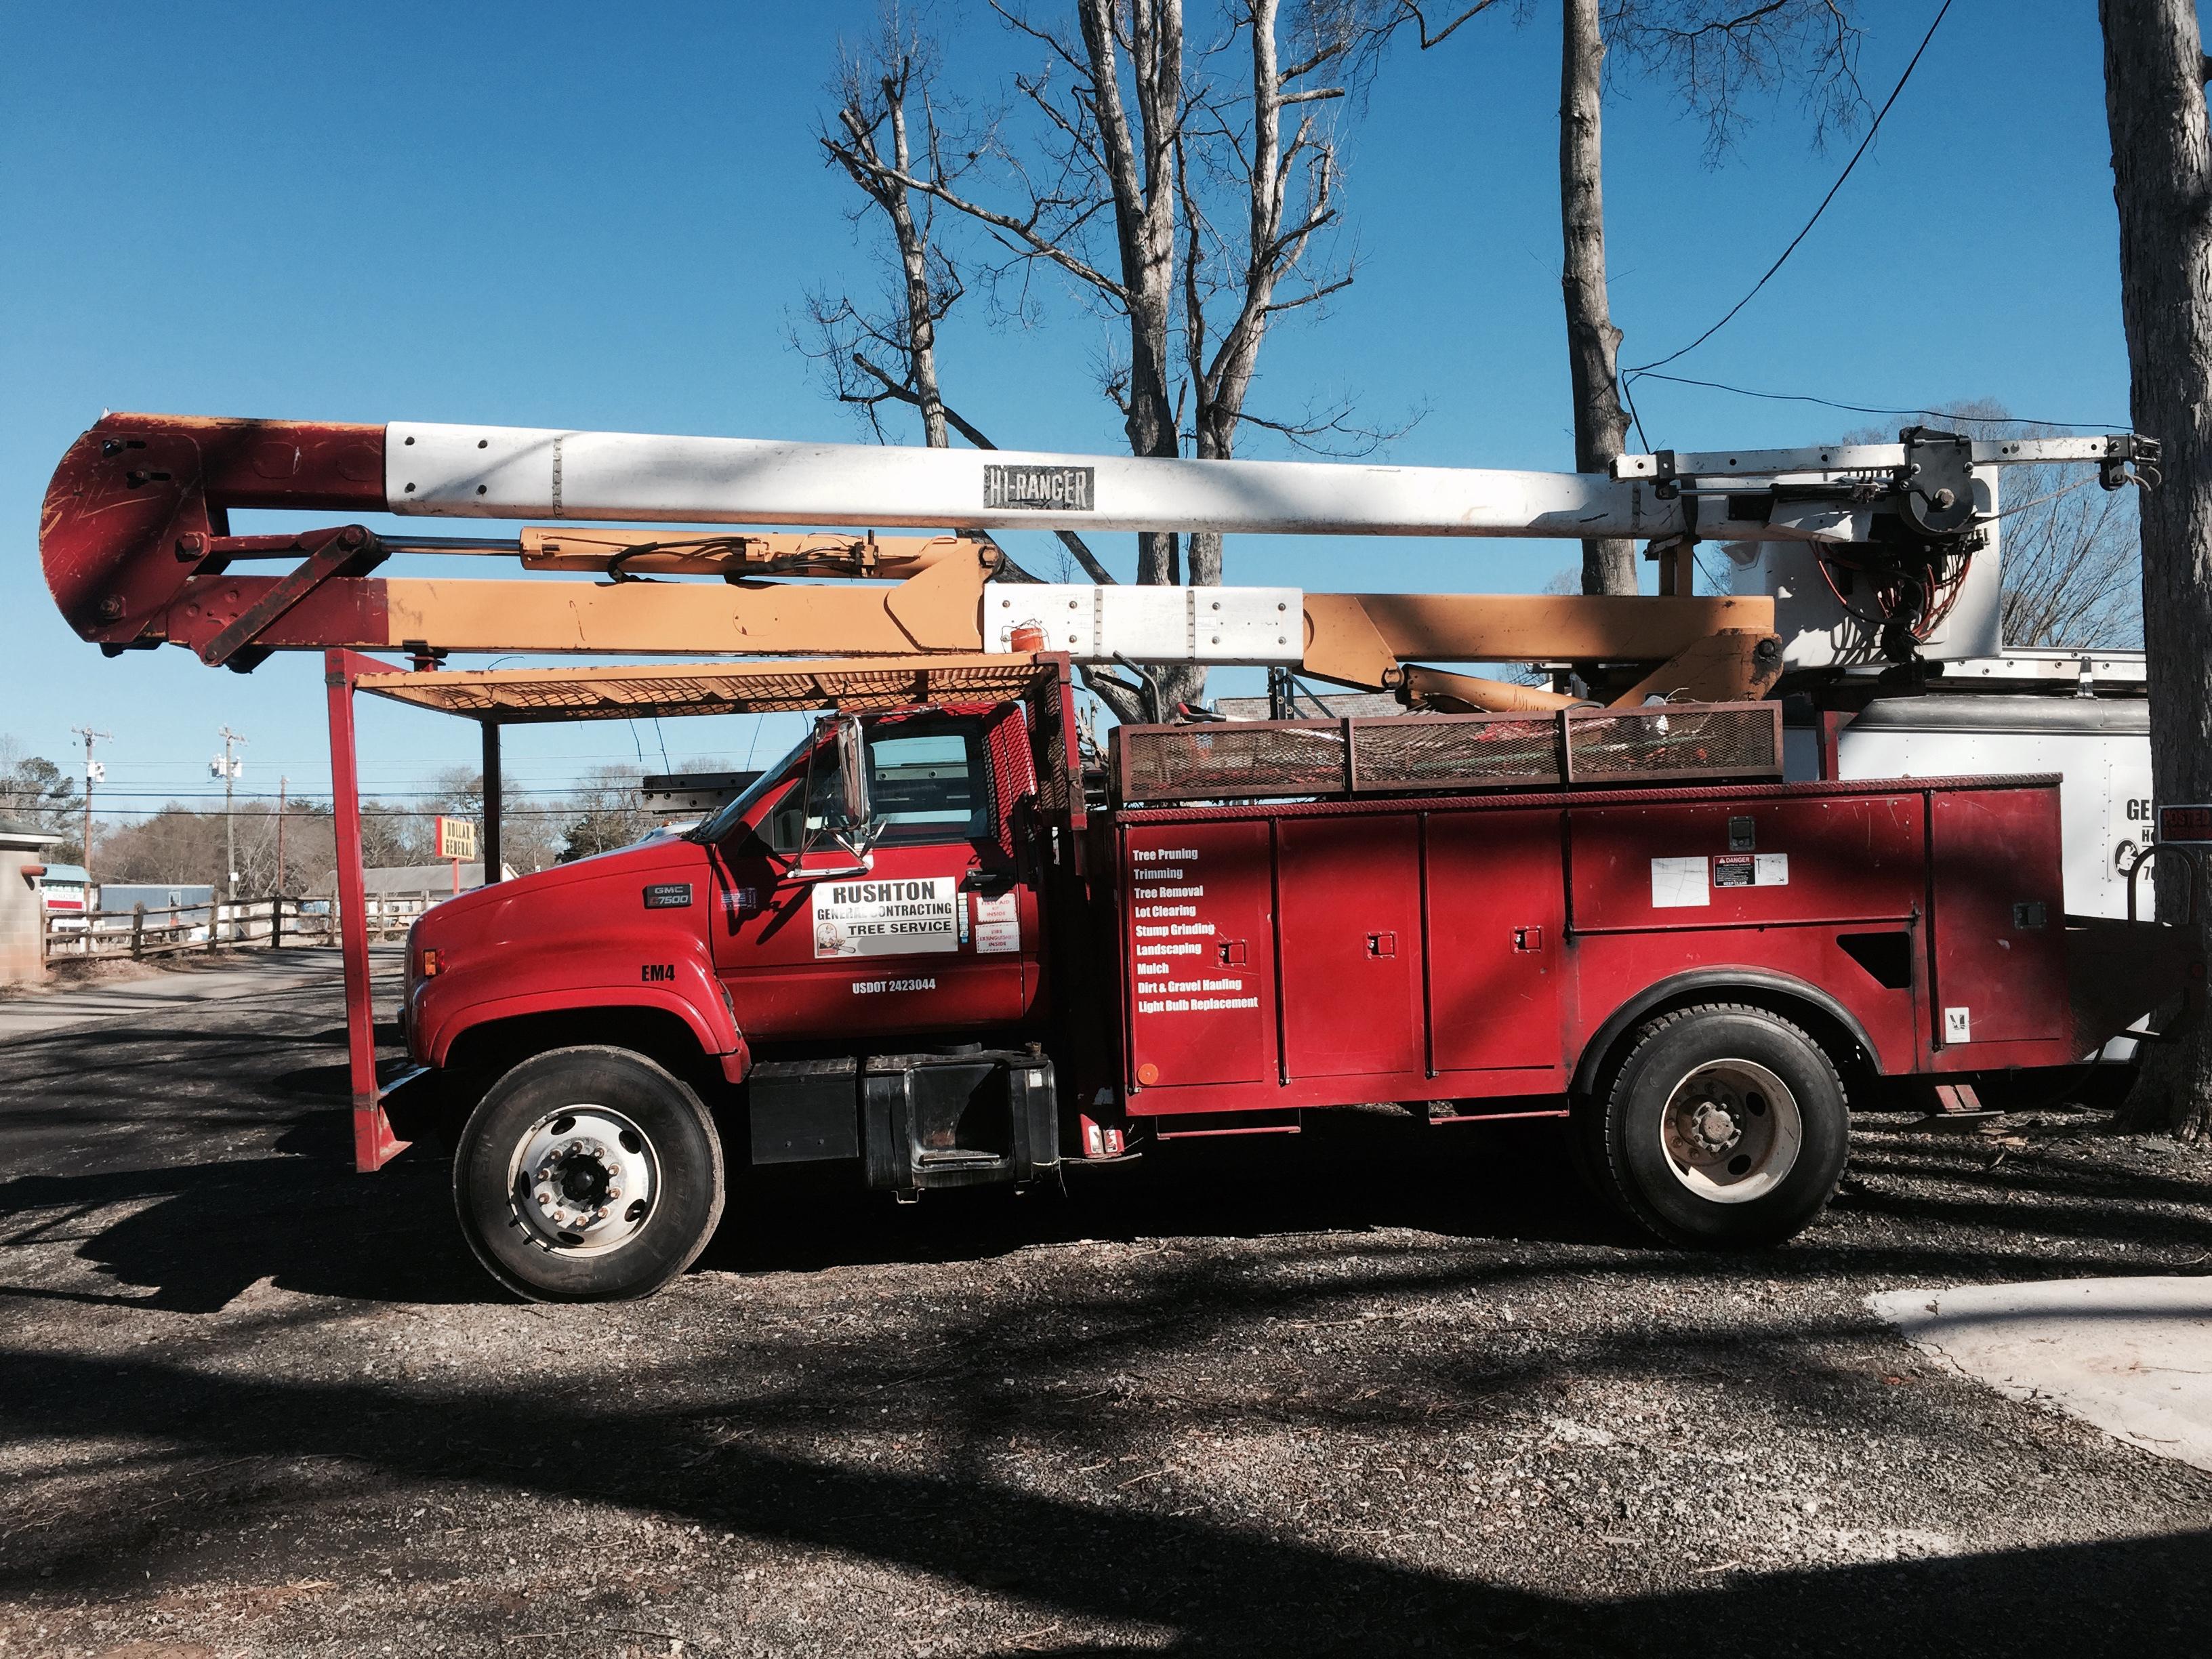 Tree Removal Company Truck, Gastonia NC